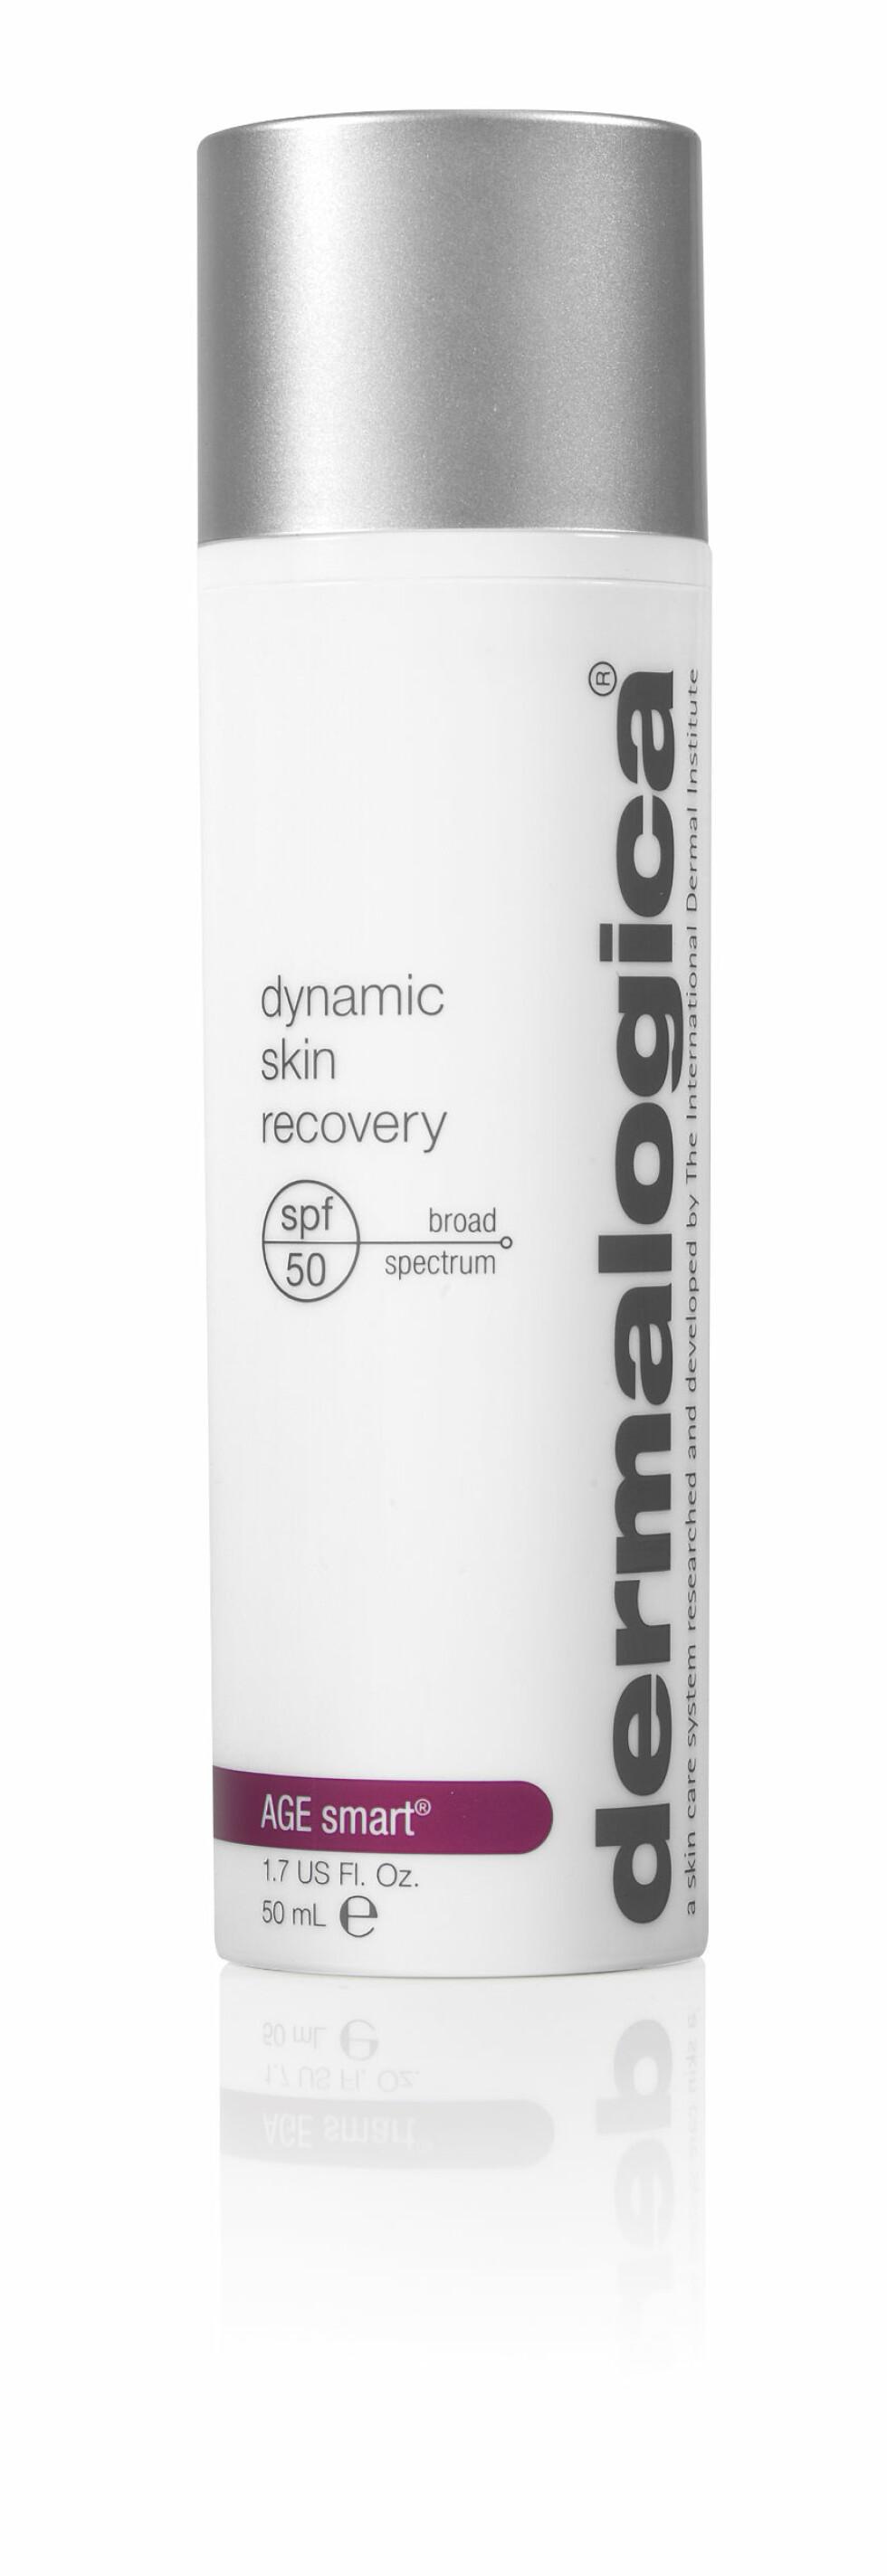 Dynamic Skin Recovery fra Dermalogica, SPF 50, kr 845. Foto: Produsenten